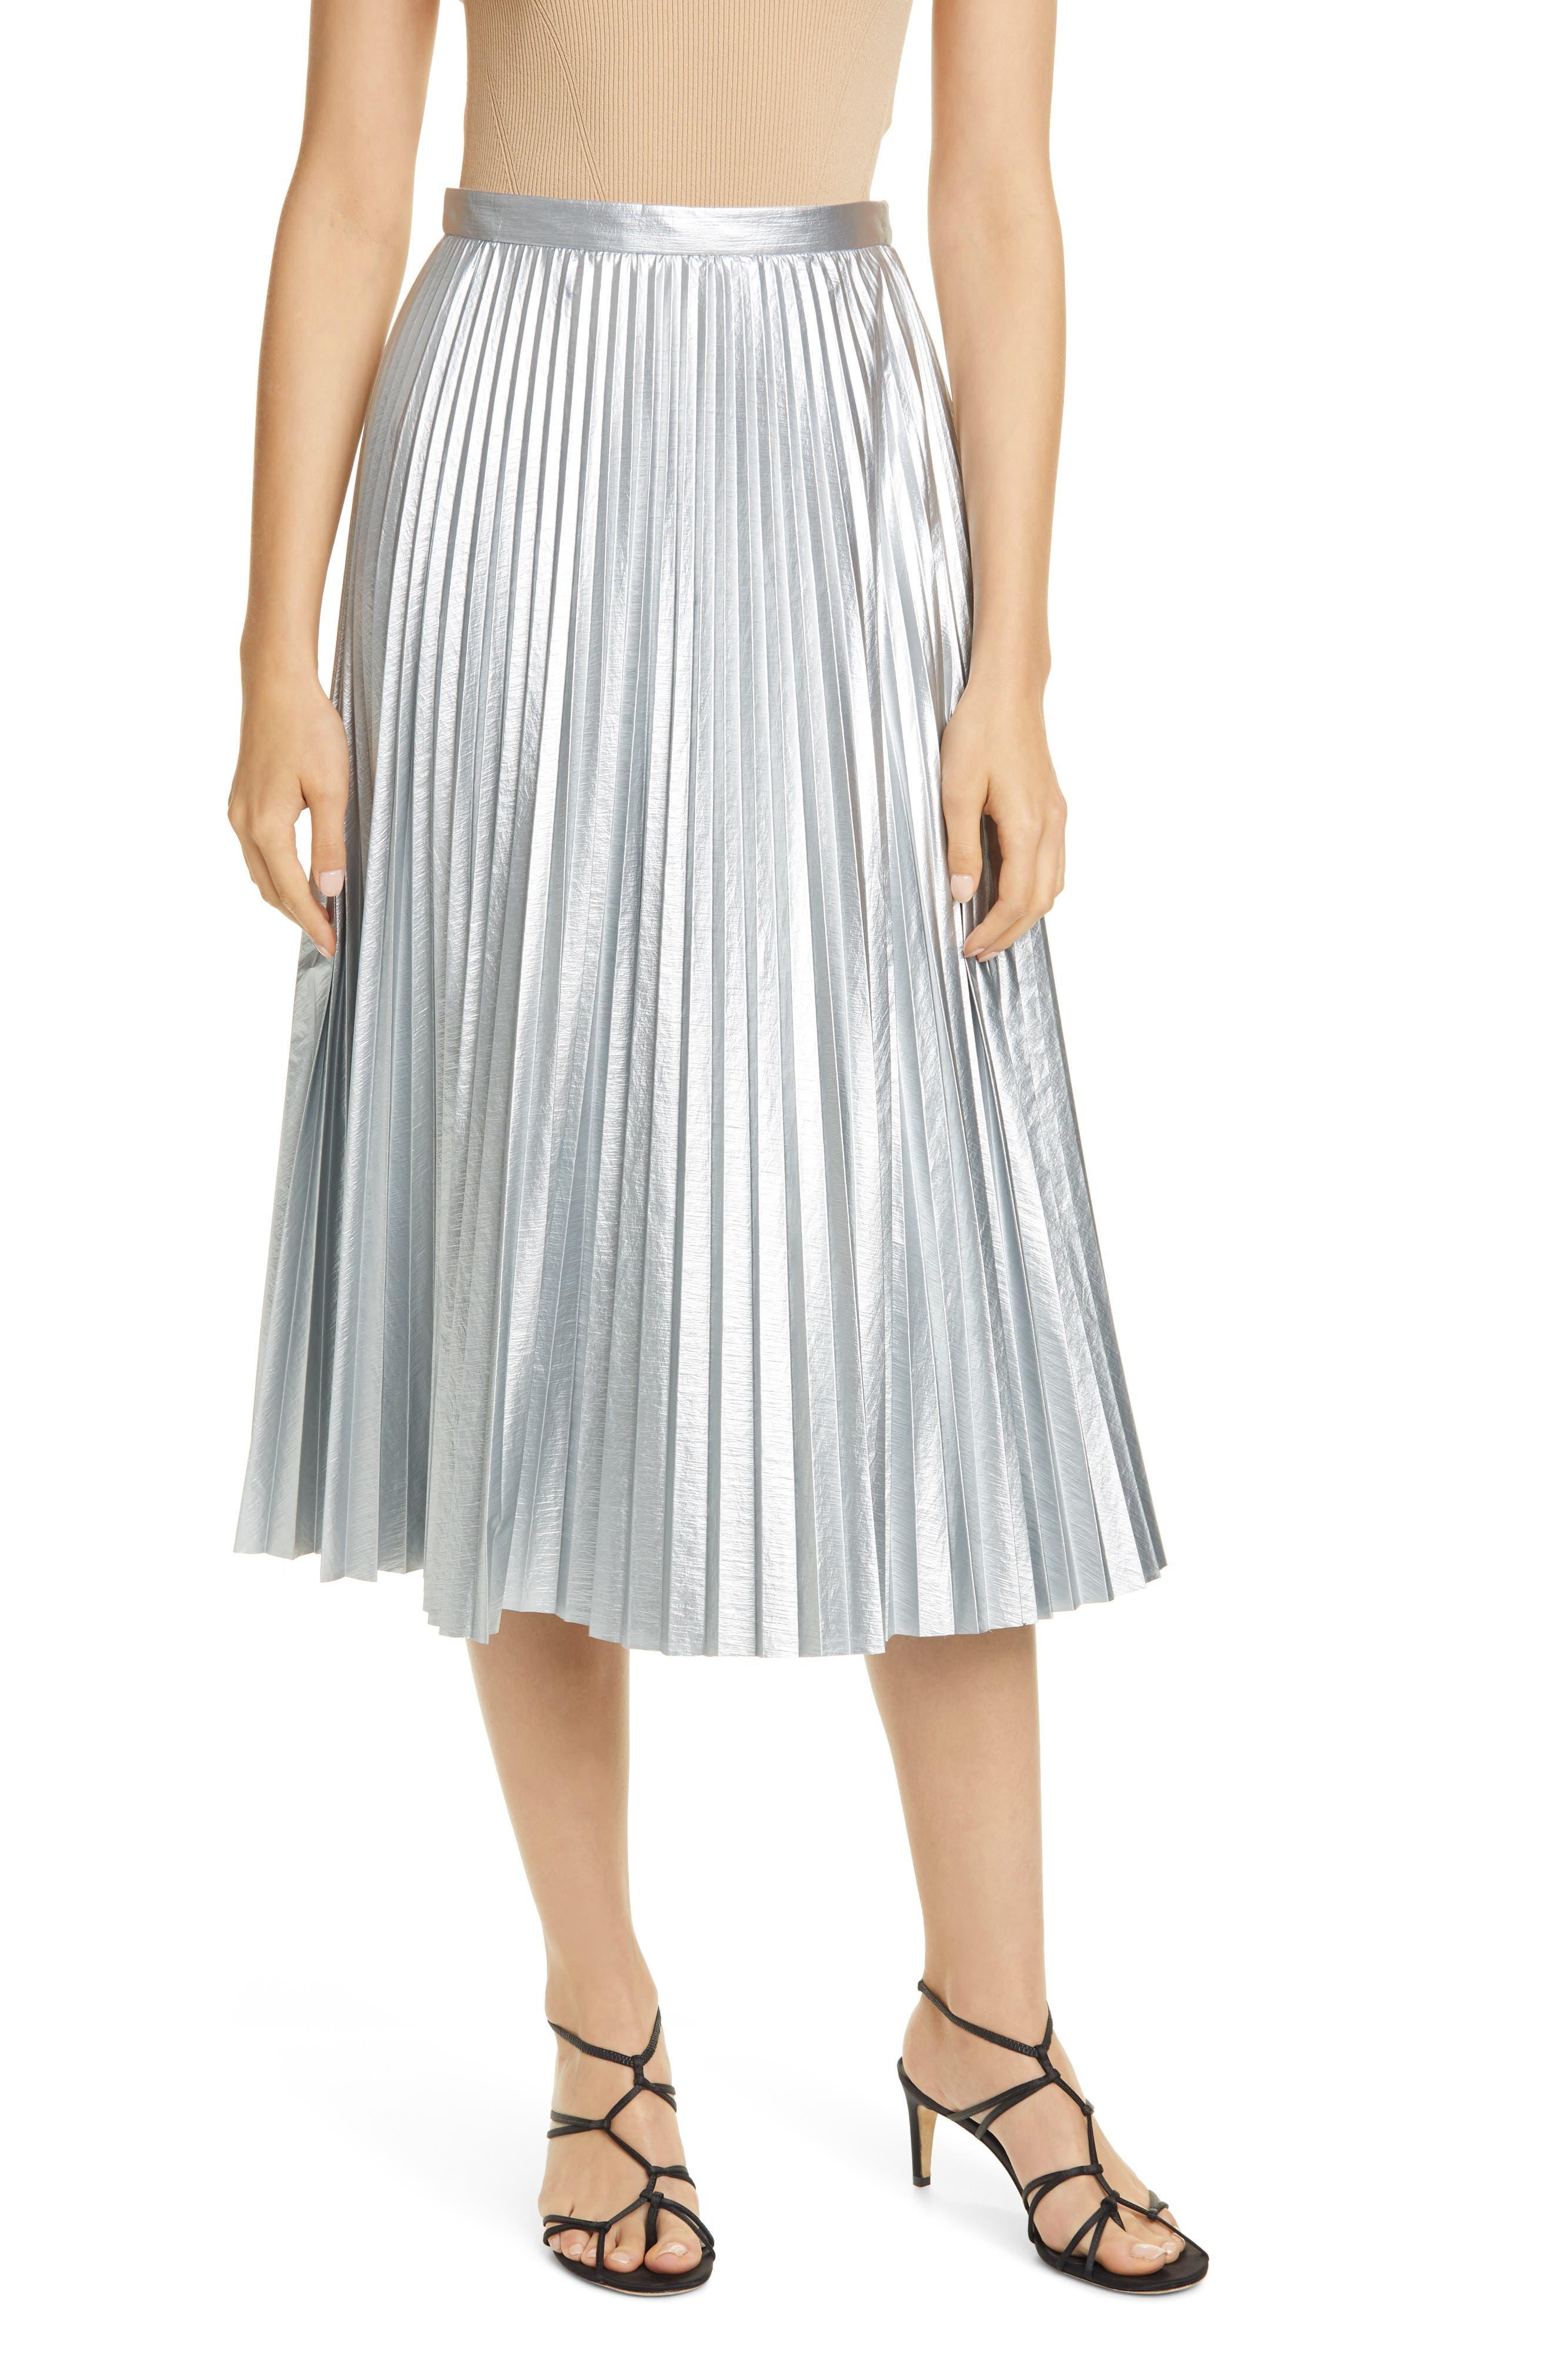 Image of Tibi Metallic Pleated Skirt